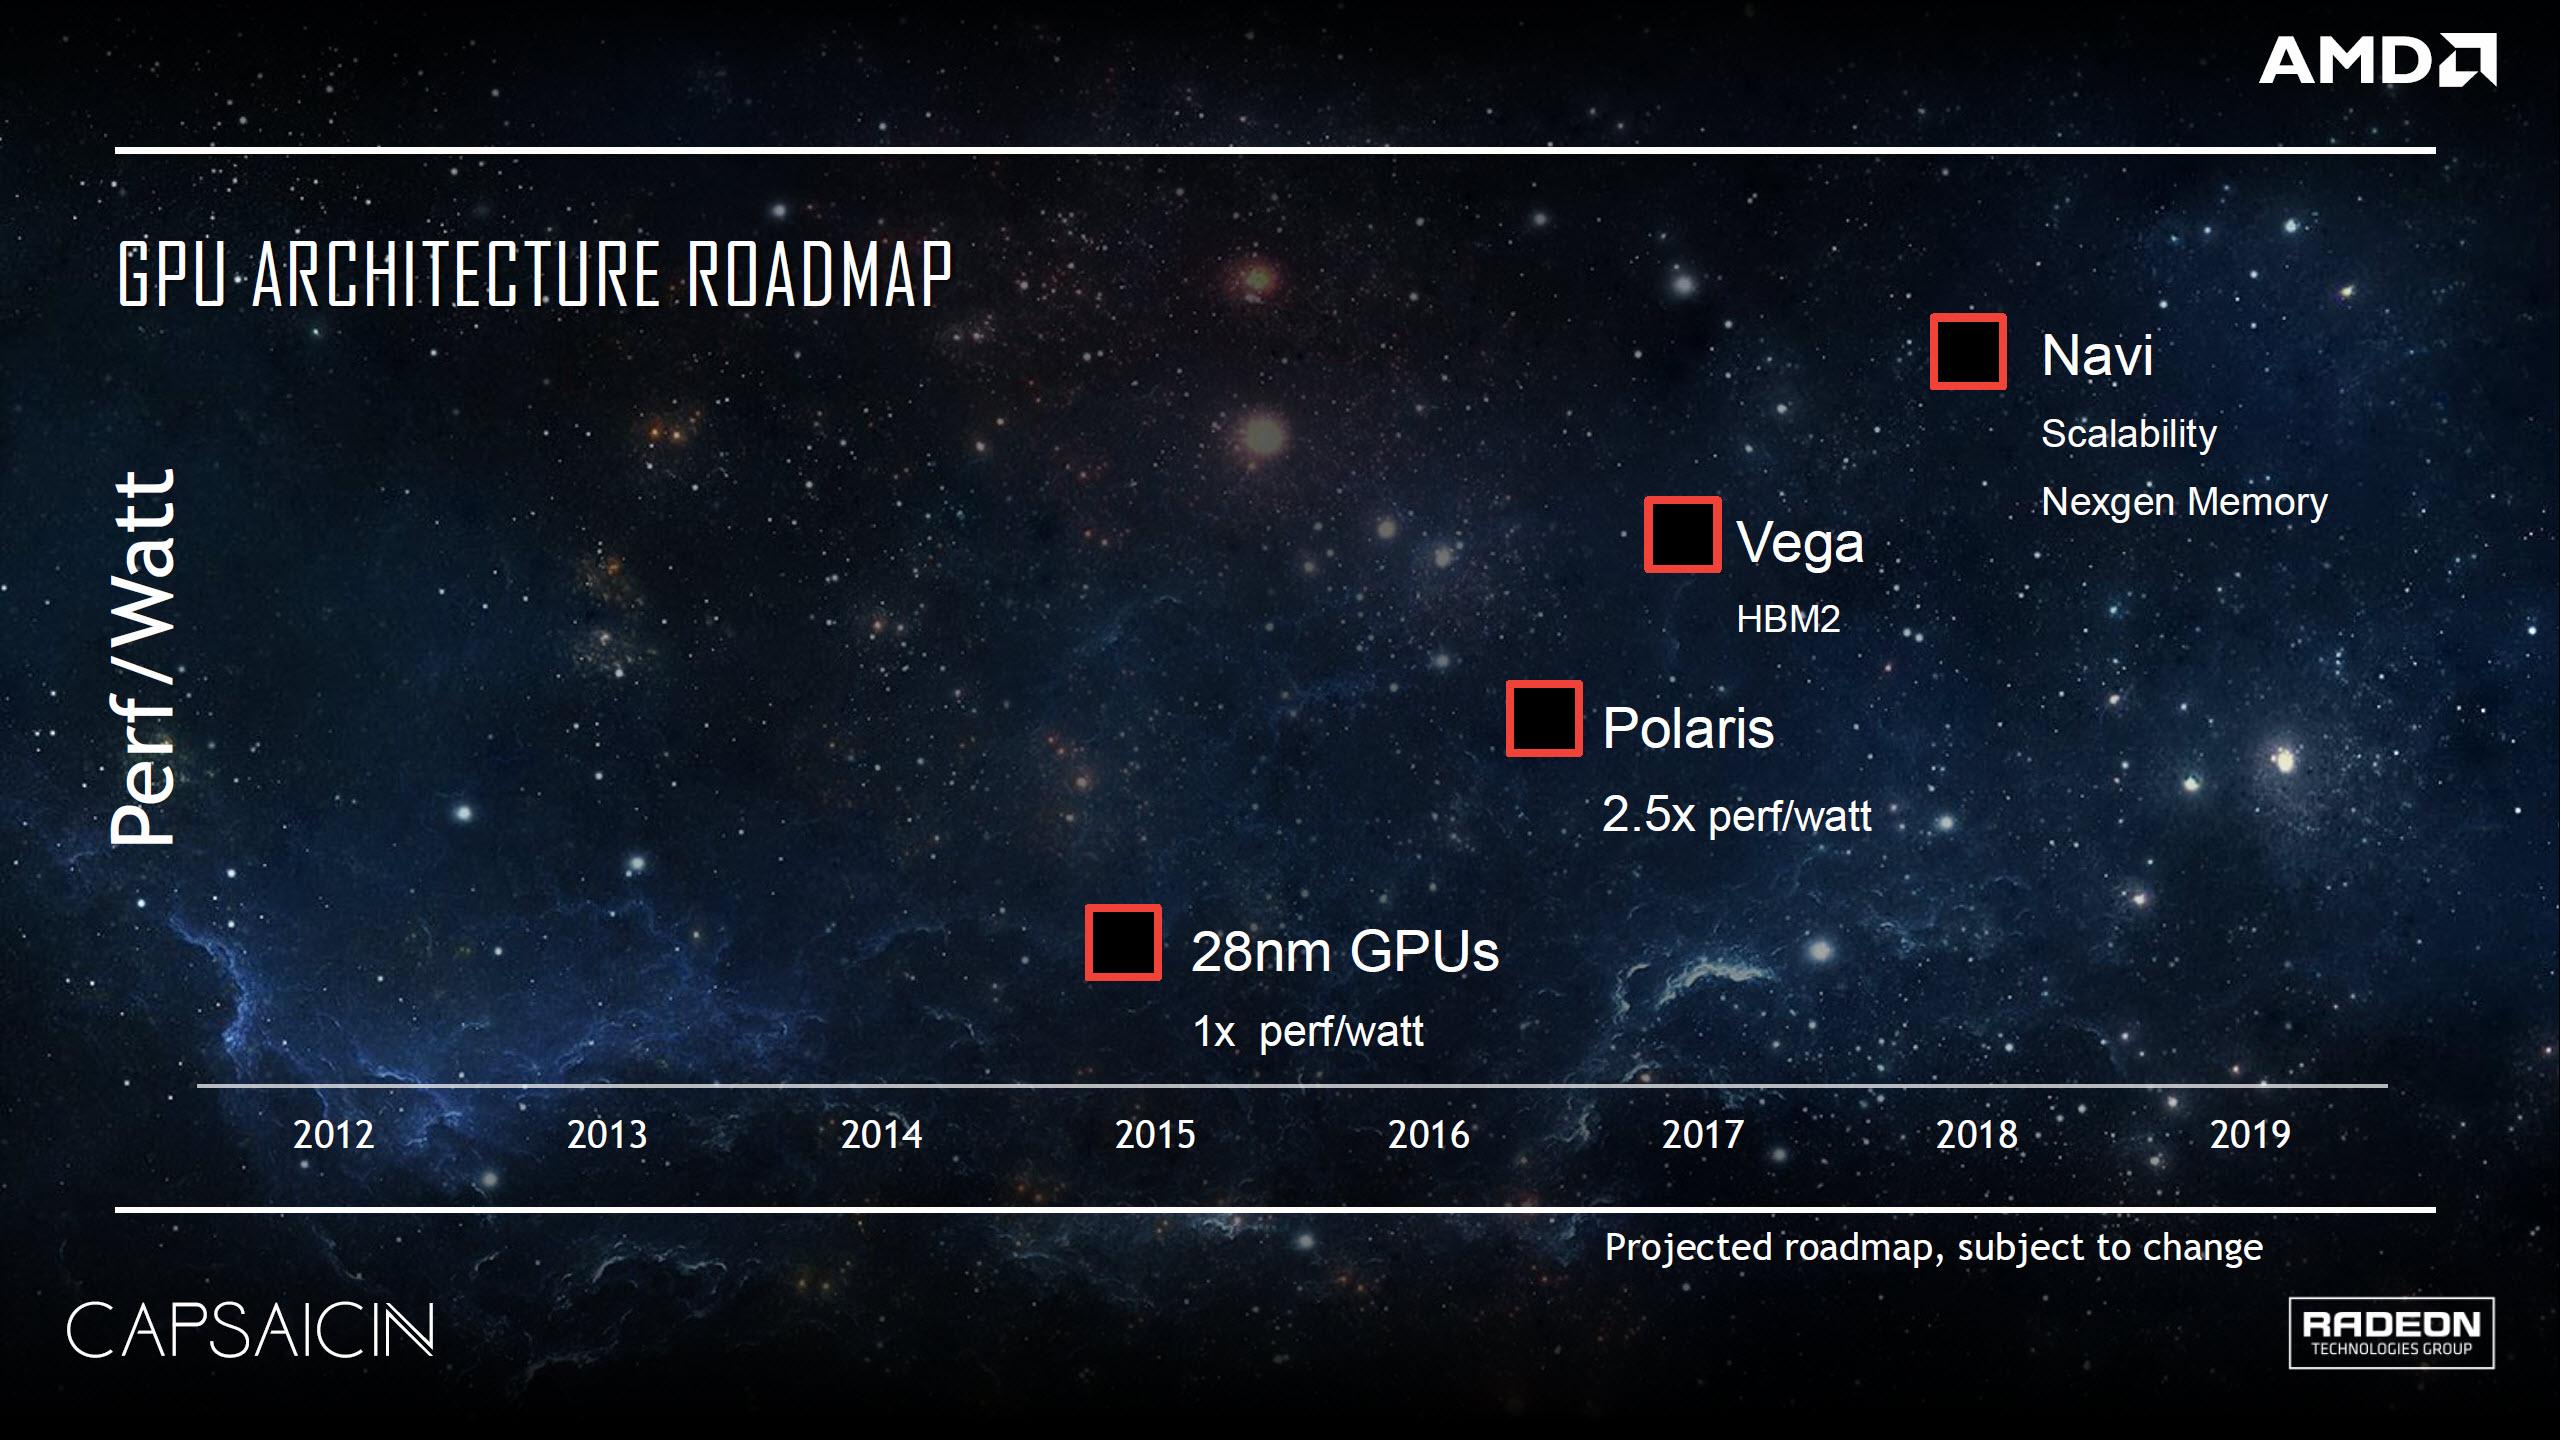 AMD Radeon RX Vega 64 package includes dead Vega GPU